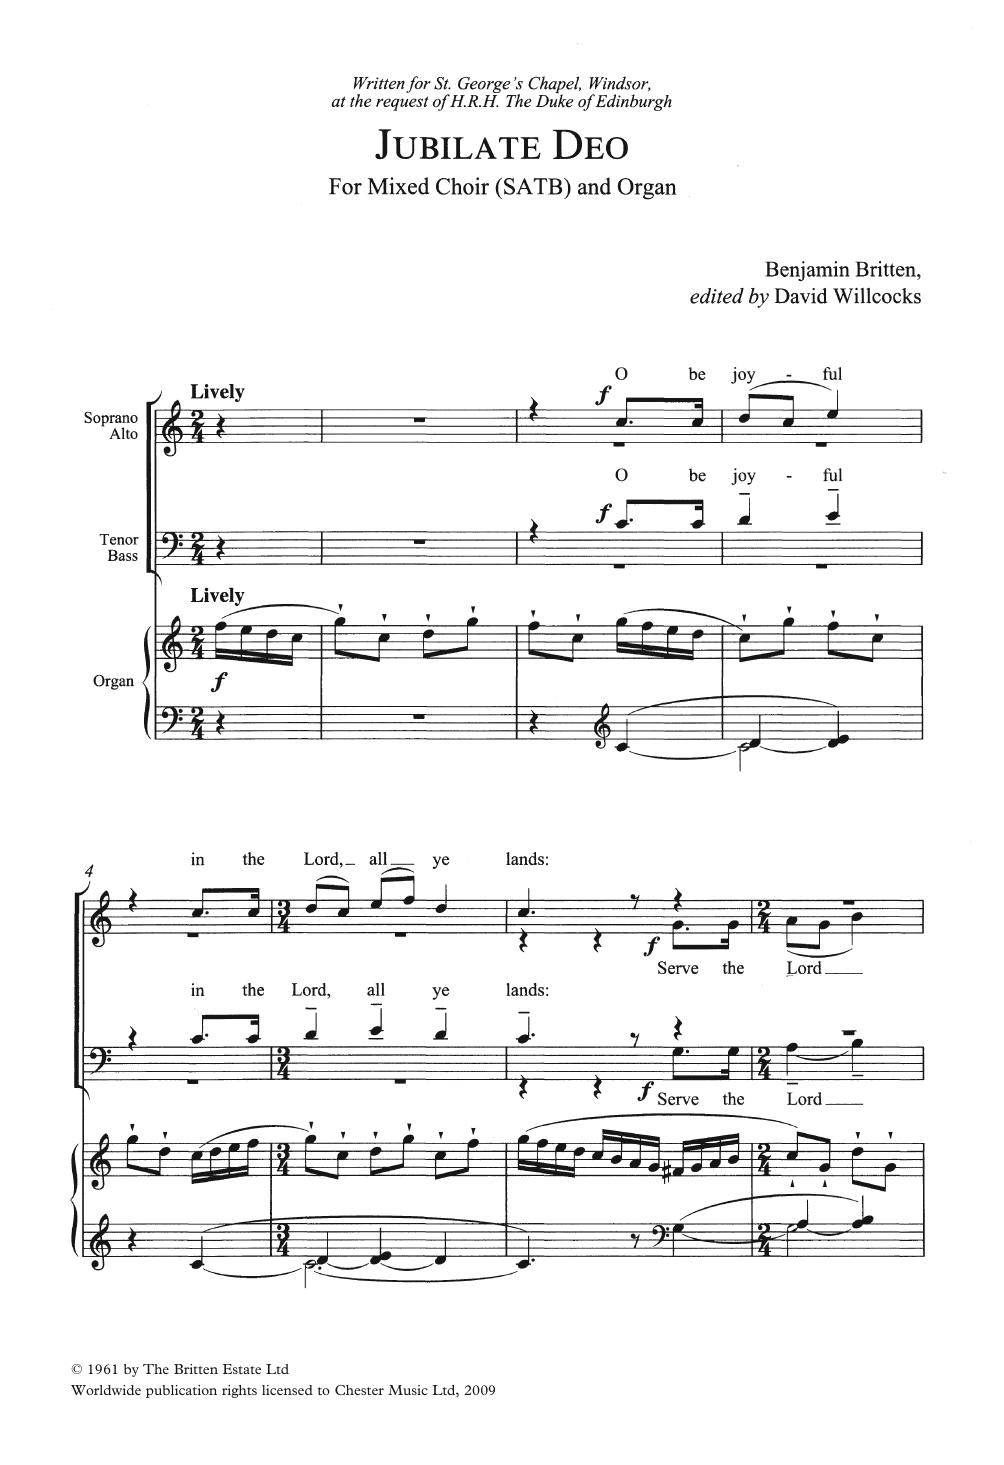 Jubilate Deo In C Major Sheet Music